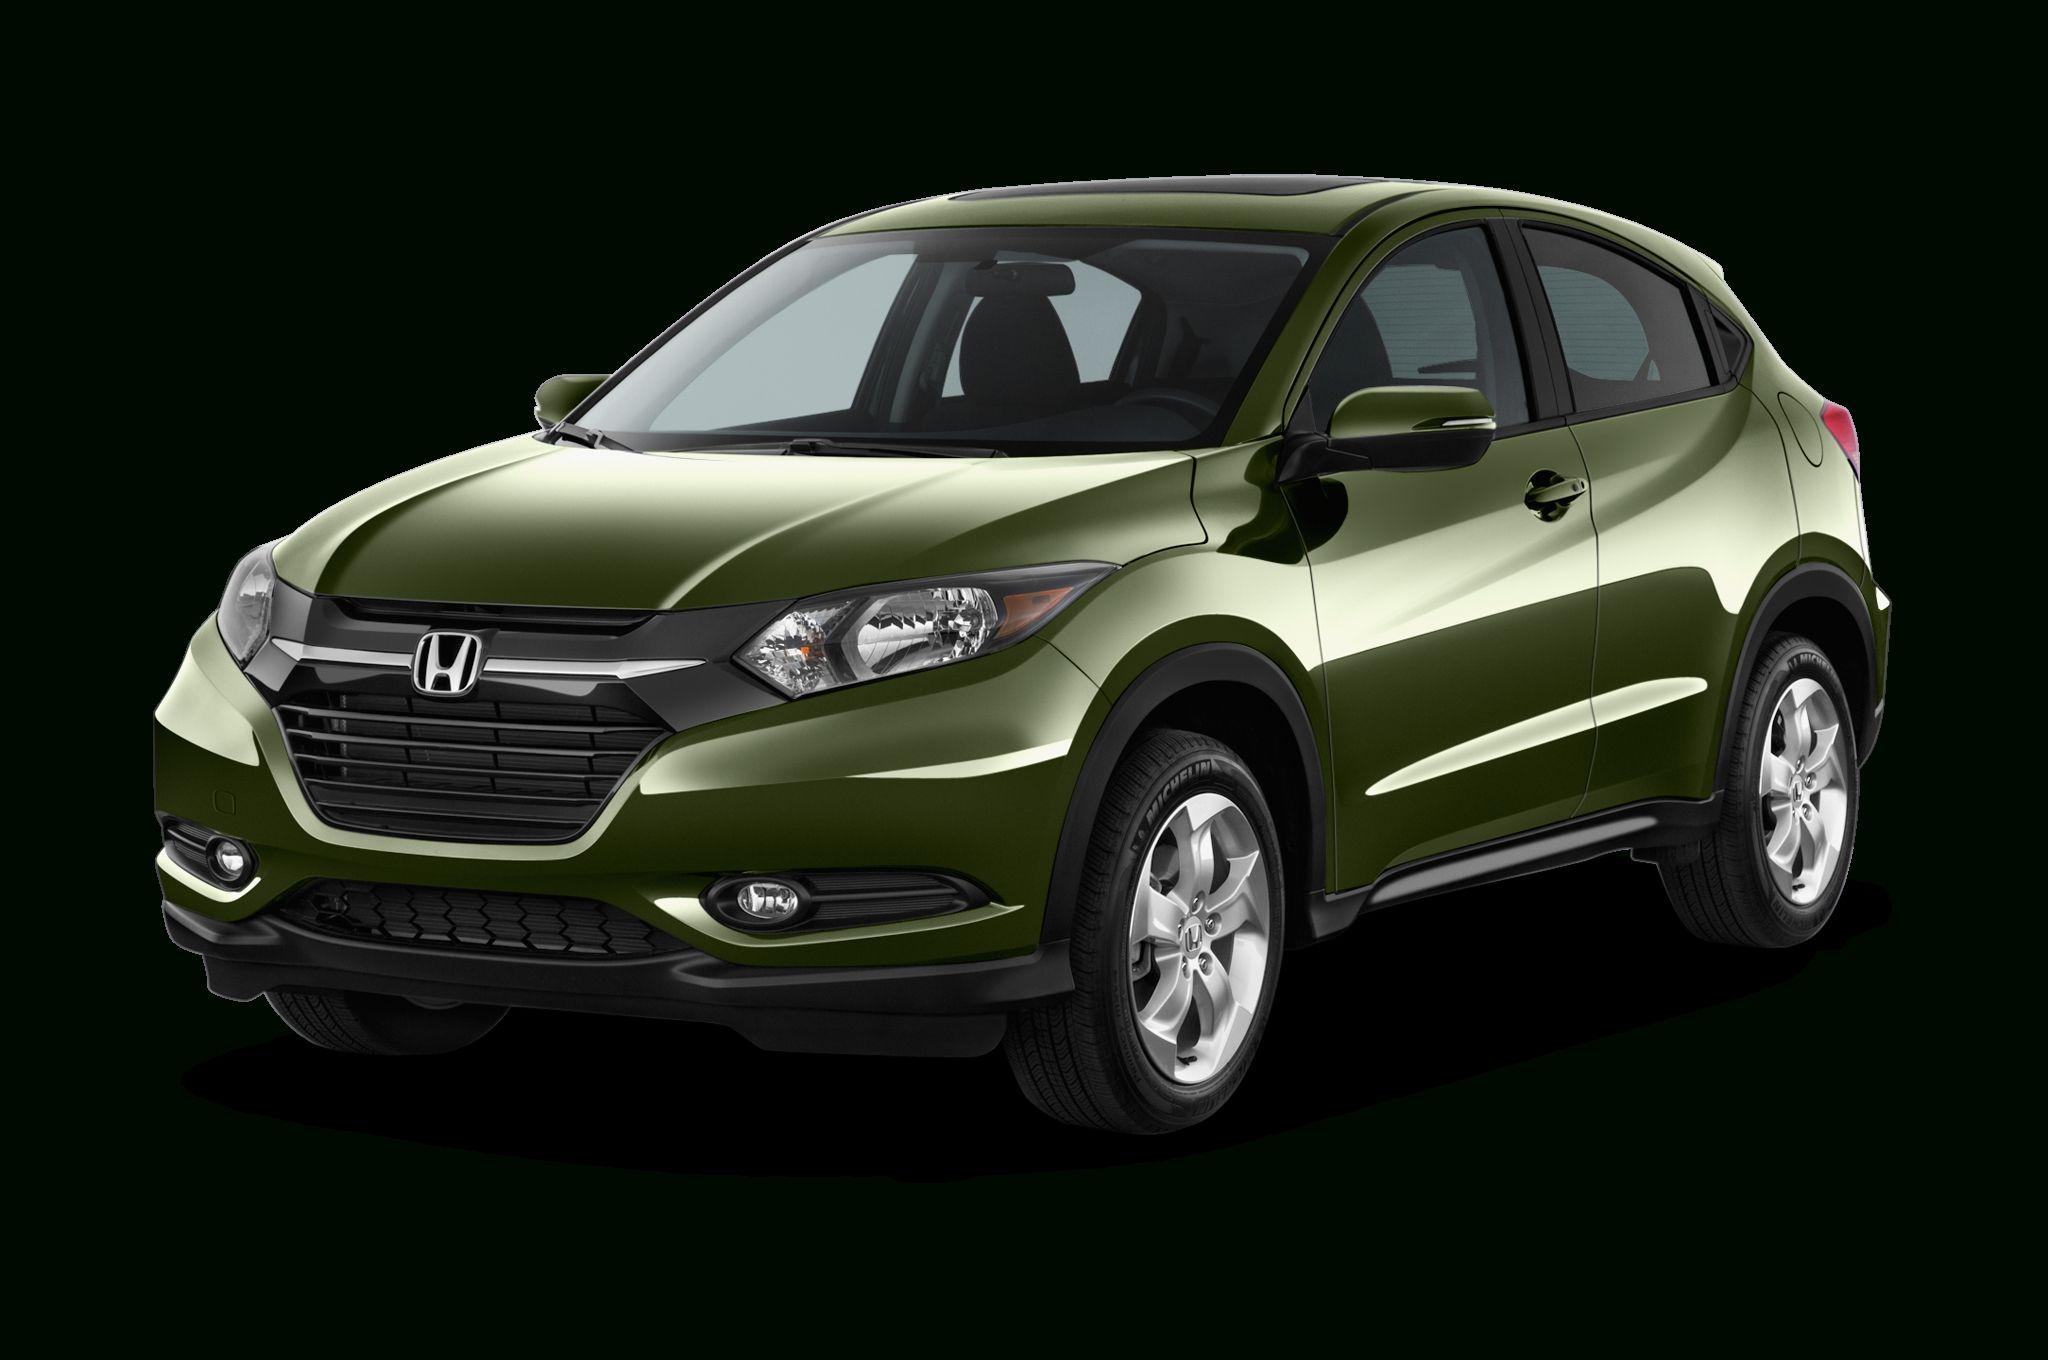 2019 Honda Hrv Towing Capacity Overview Honda hrv, Small